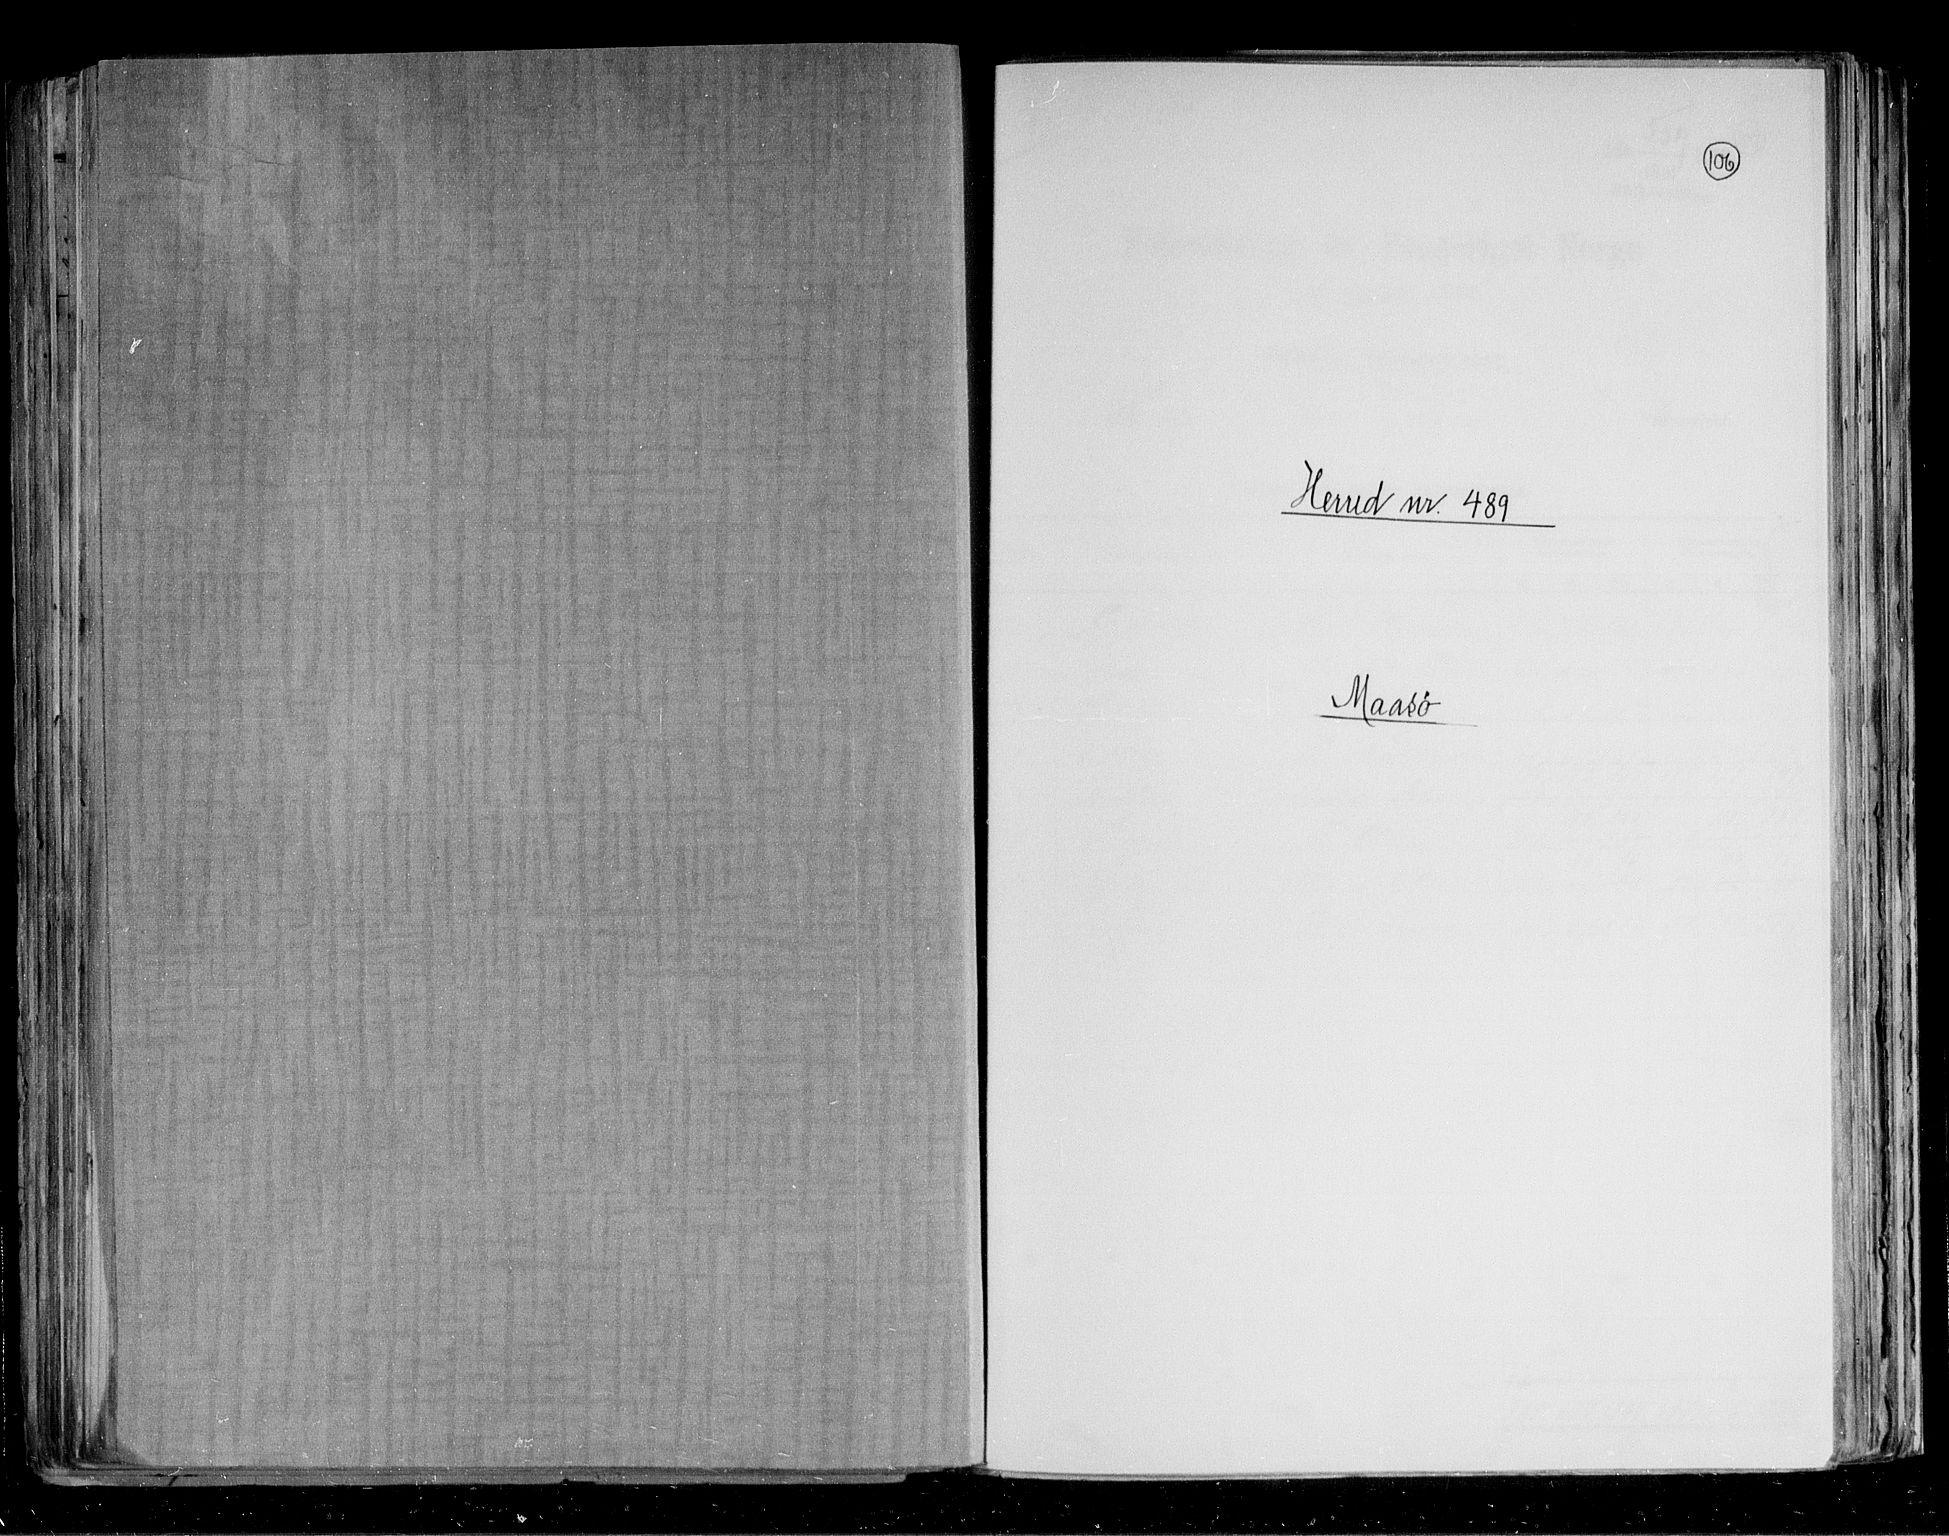 RA, Folketelling 1891 for 2018 Måsøy herred, 1891, s. 1